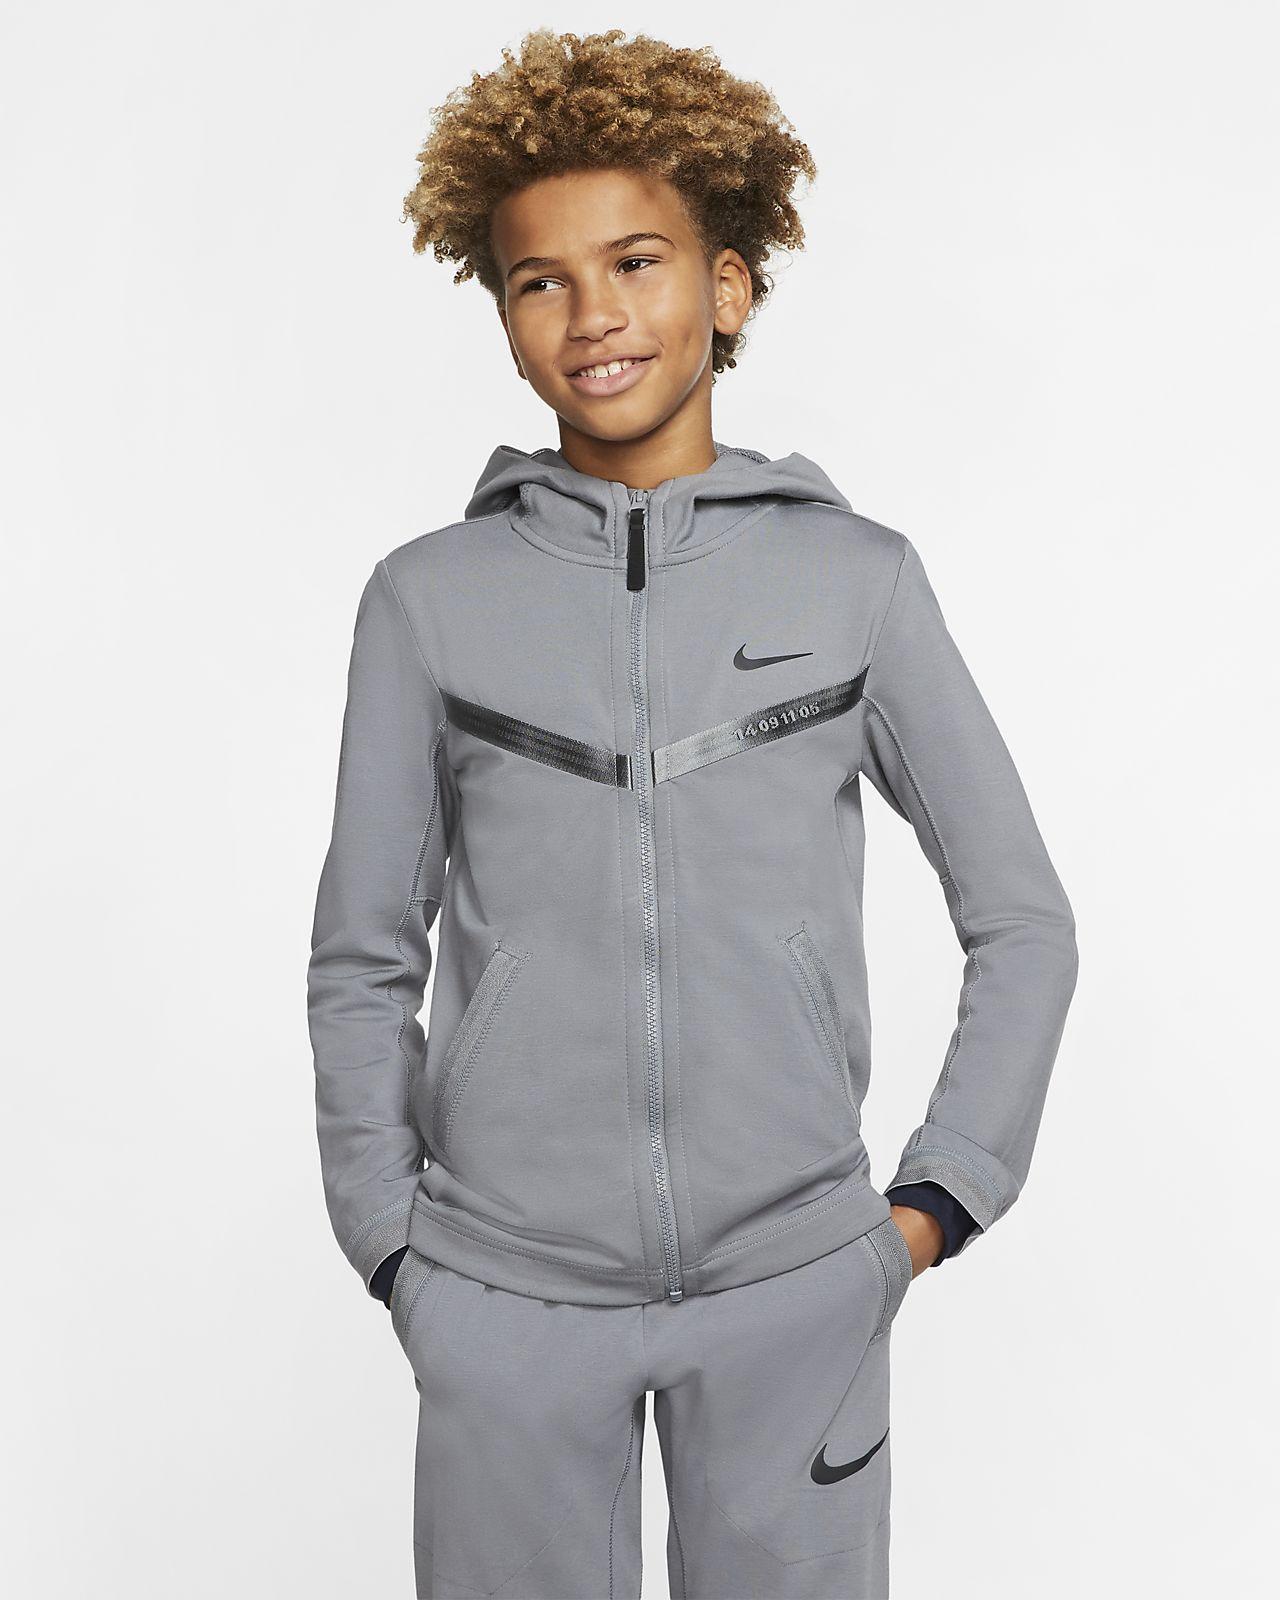 Nike Sportswear Tech Pack hettejakke med hel glidelås til store barn